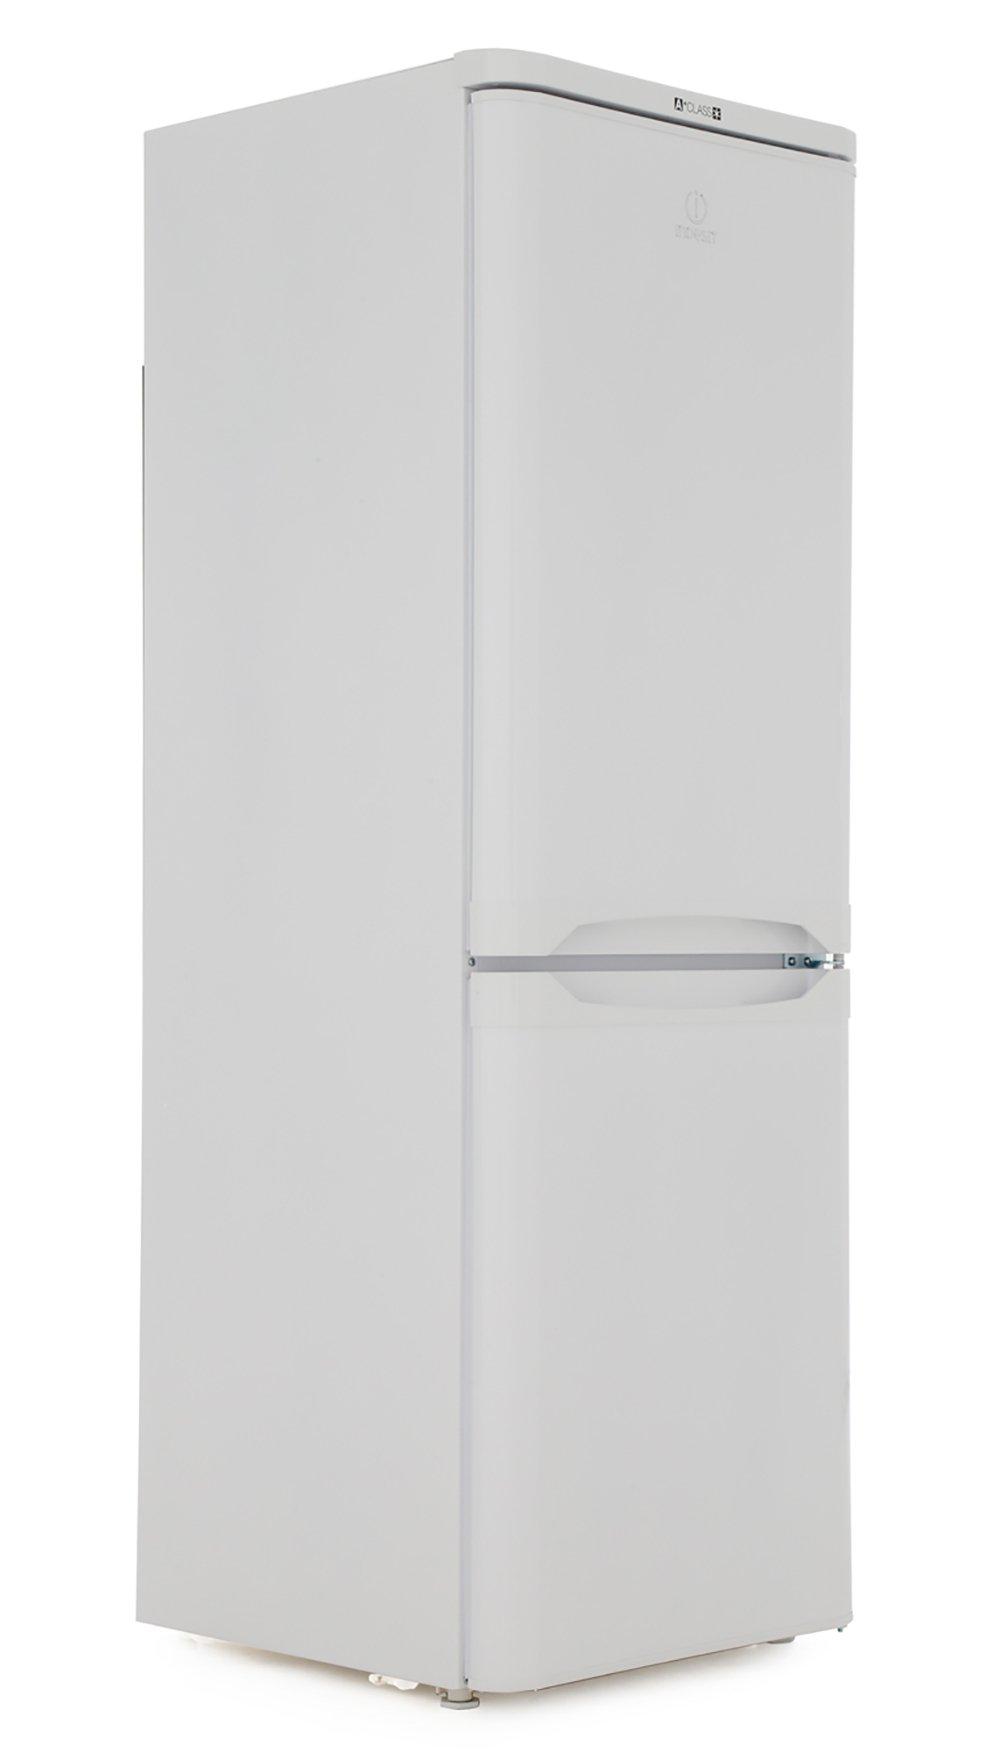 Indesit IBD5515W Low Frost Fridge Freezer